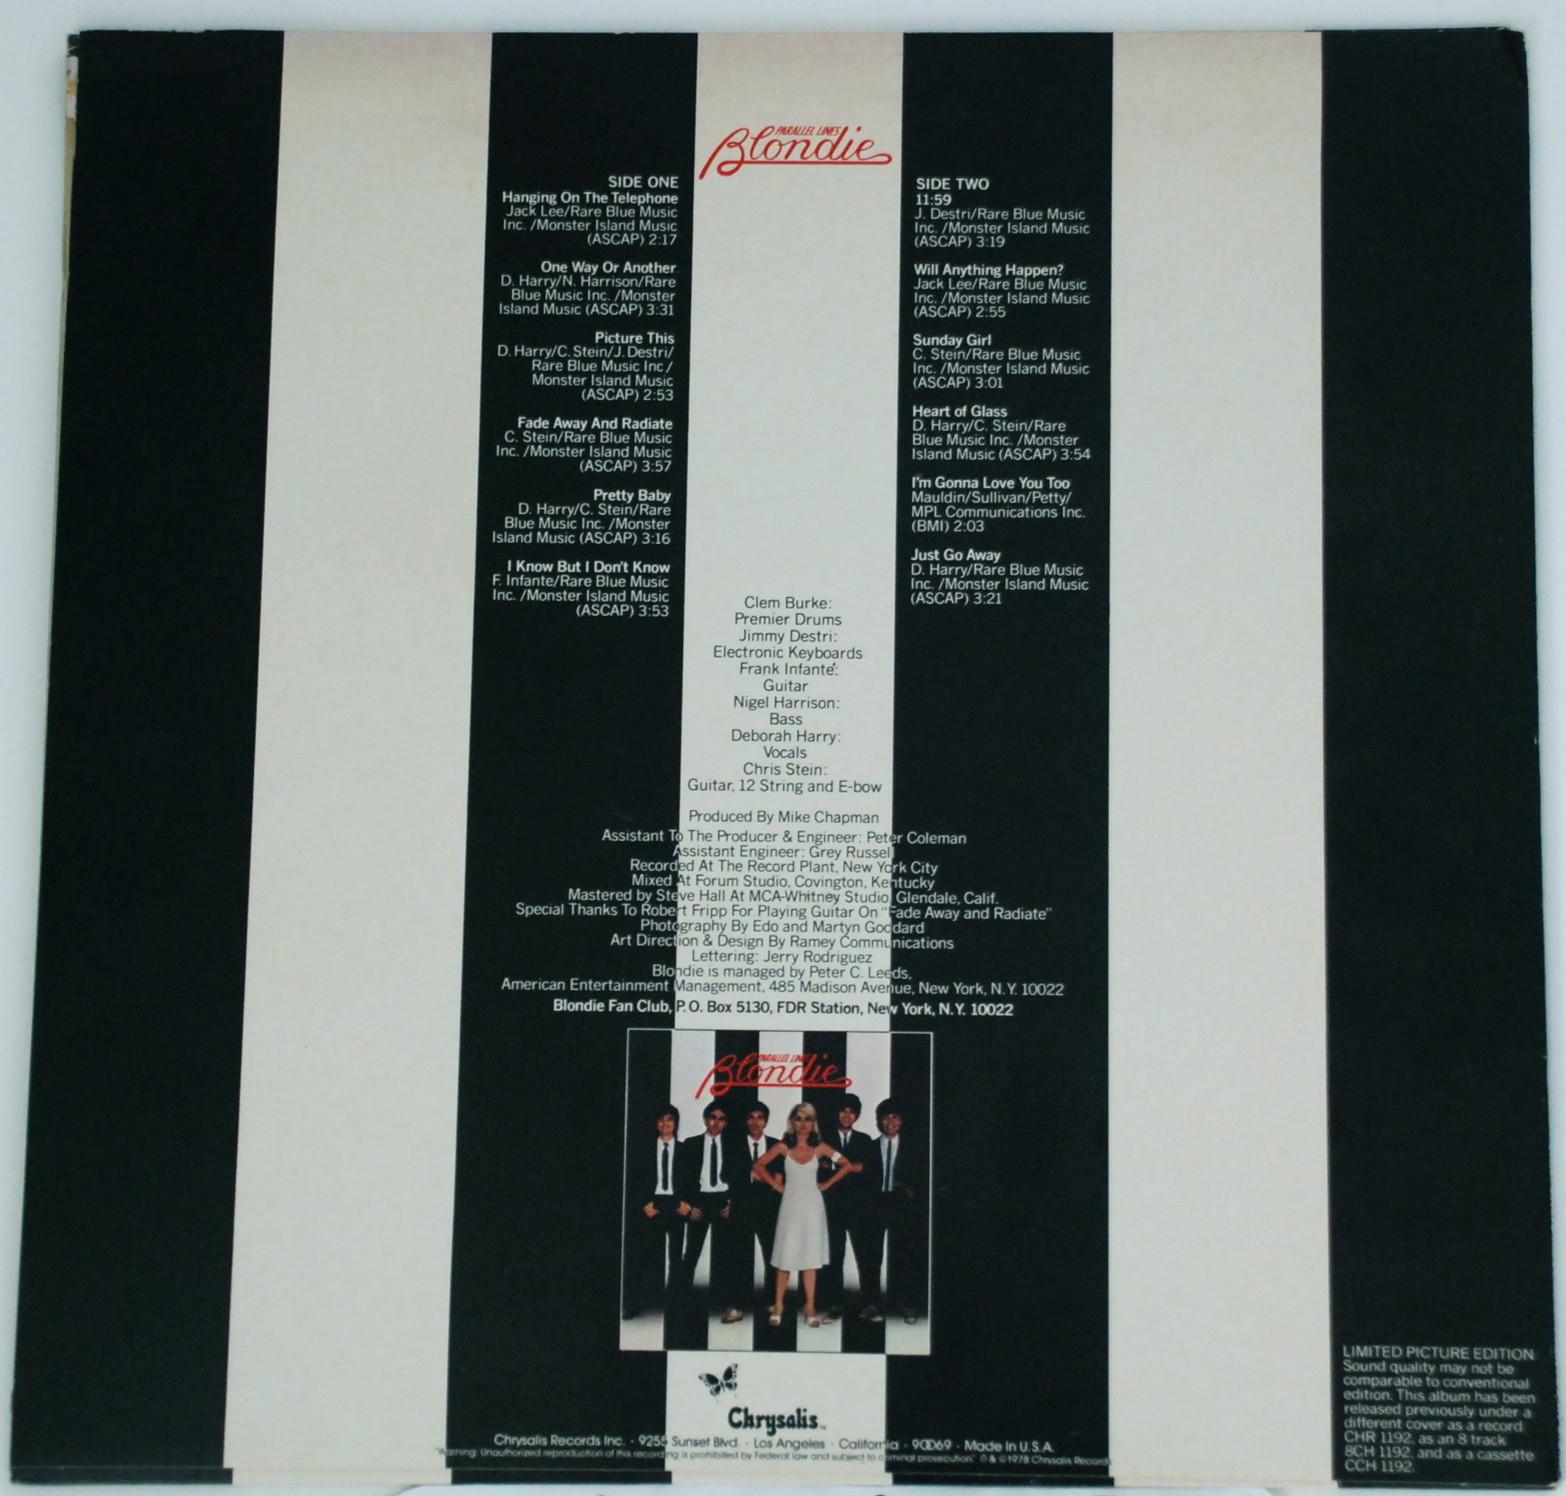 Blondie Parallel Lines Deluxe flac